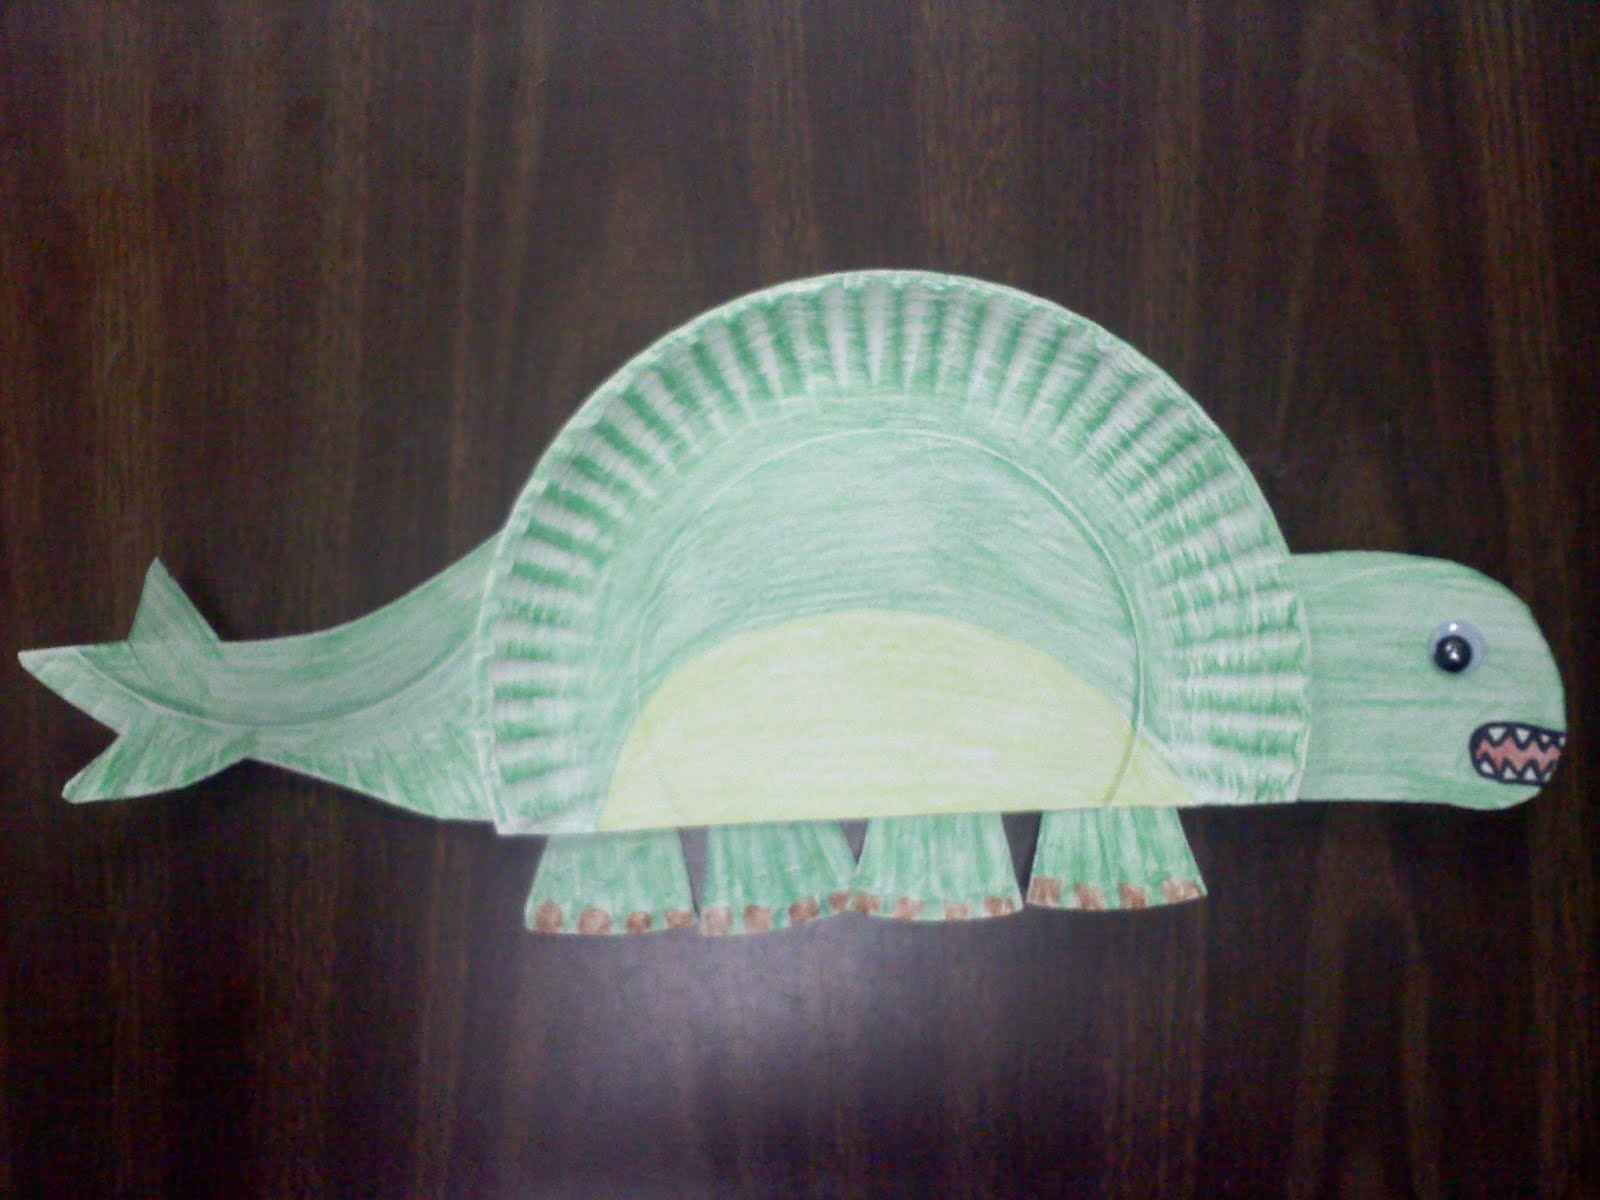 Paper Plate Dinosaur Template & Paper Crafts Ideas for Kids: Dinosaur Paper Plate Craft